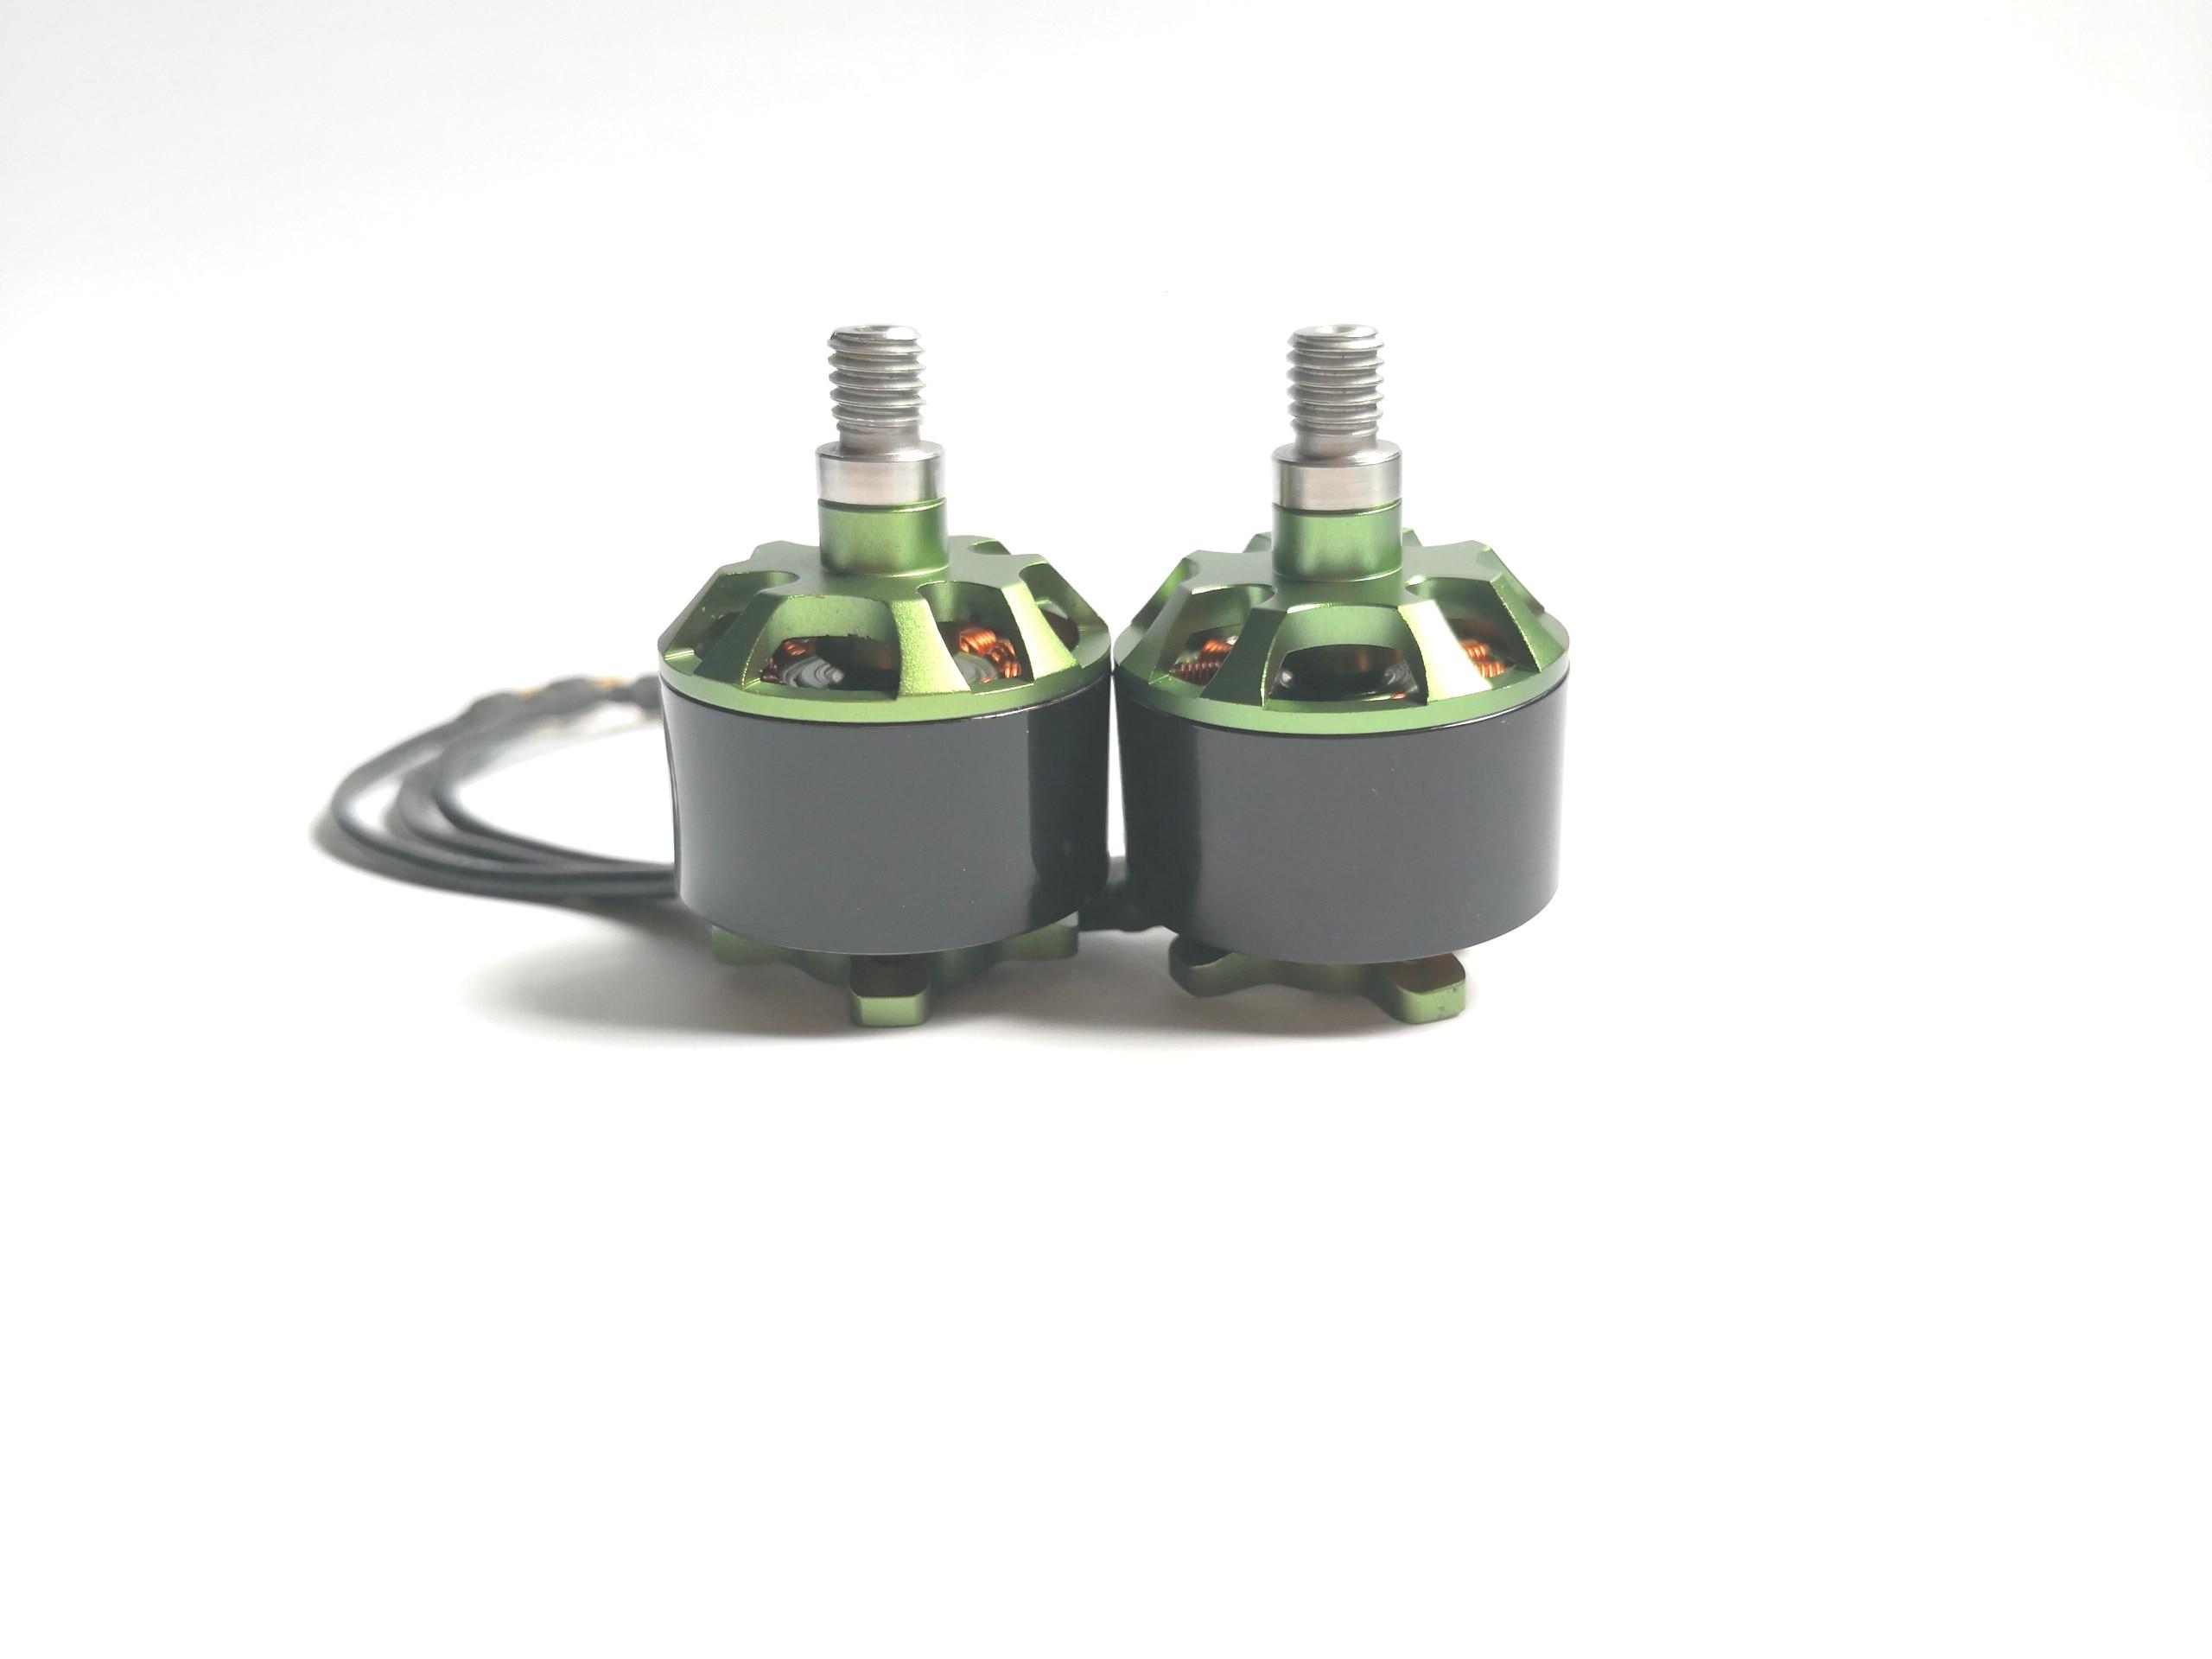 4 piezas 2312 motor sin escobillas 980KV 2312 motor CW CCW 3 S para FPV Drone Quadcopter negro/verde